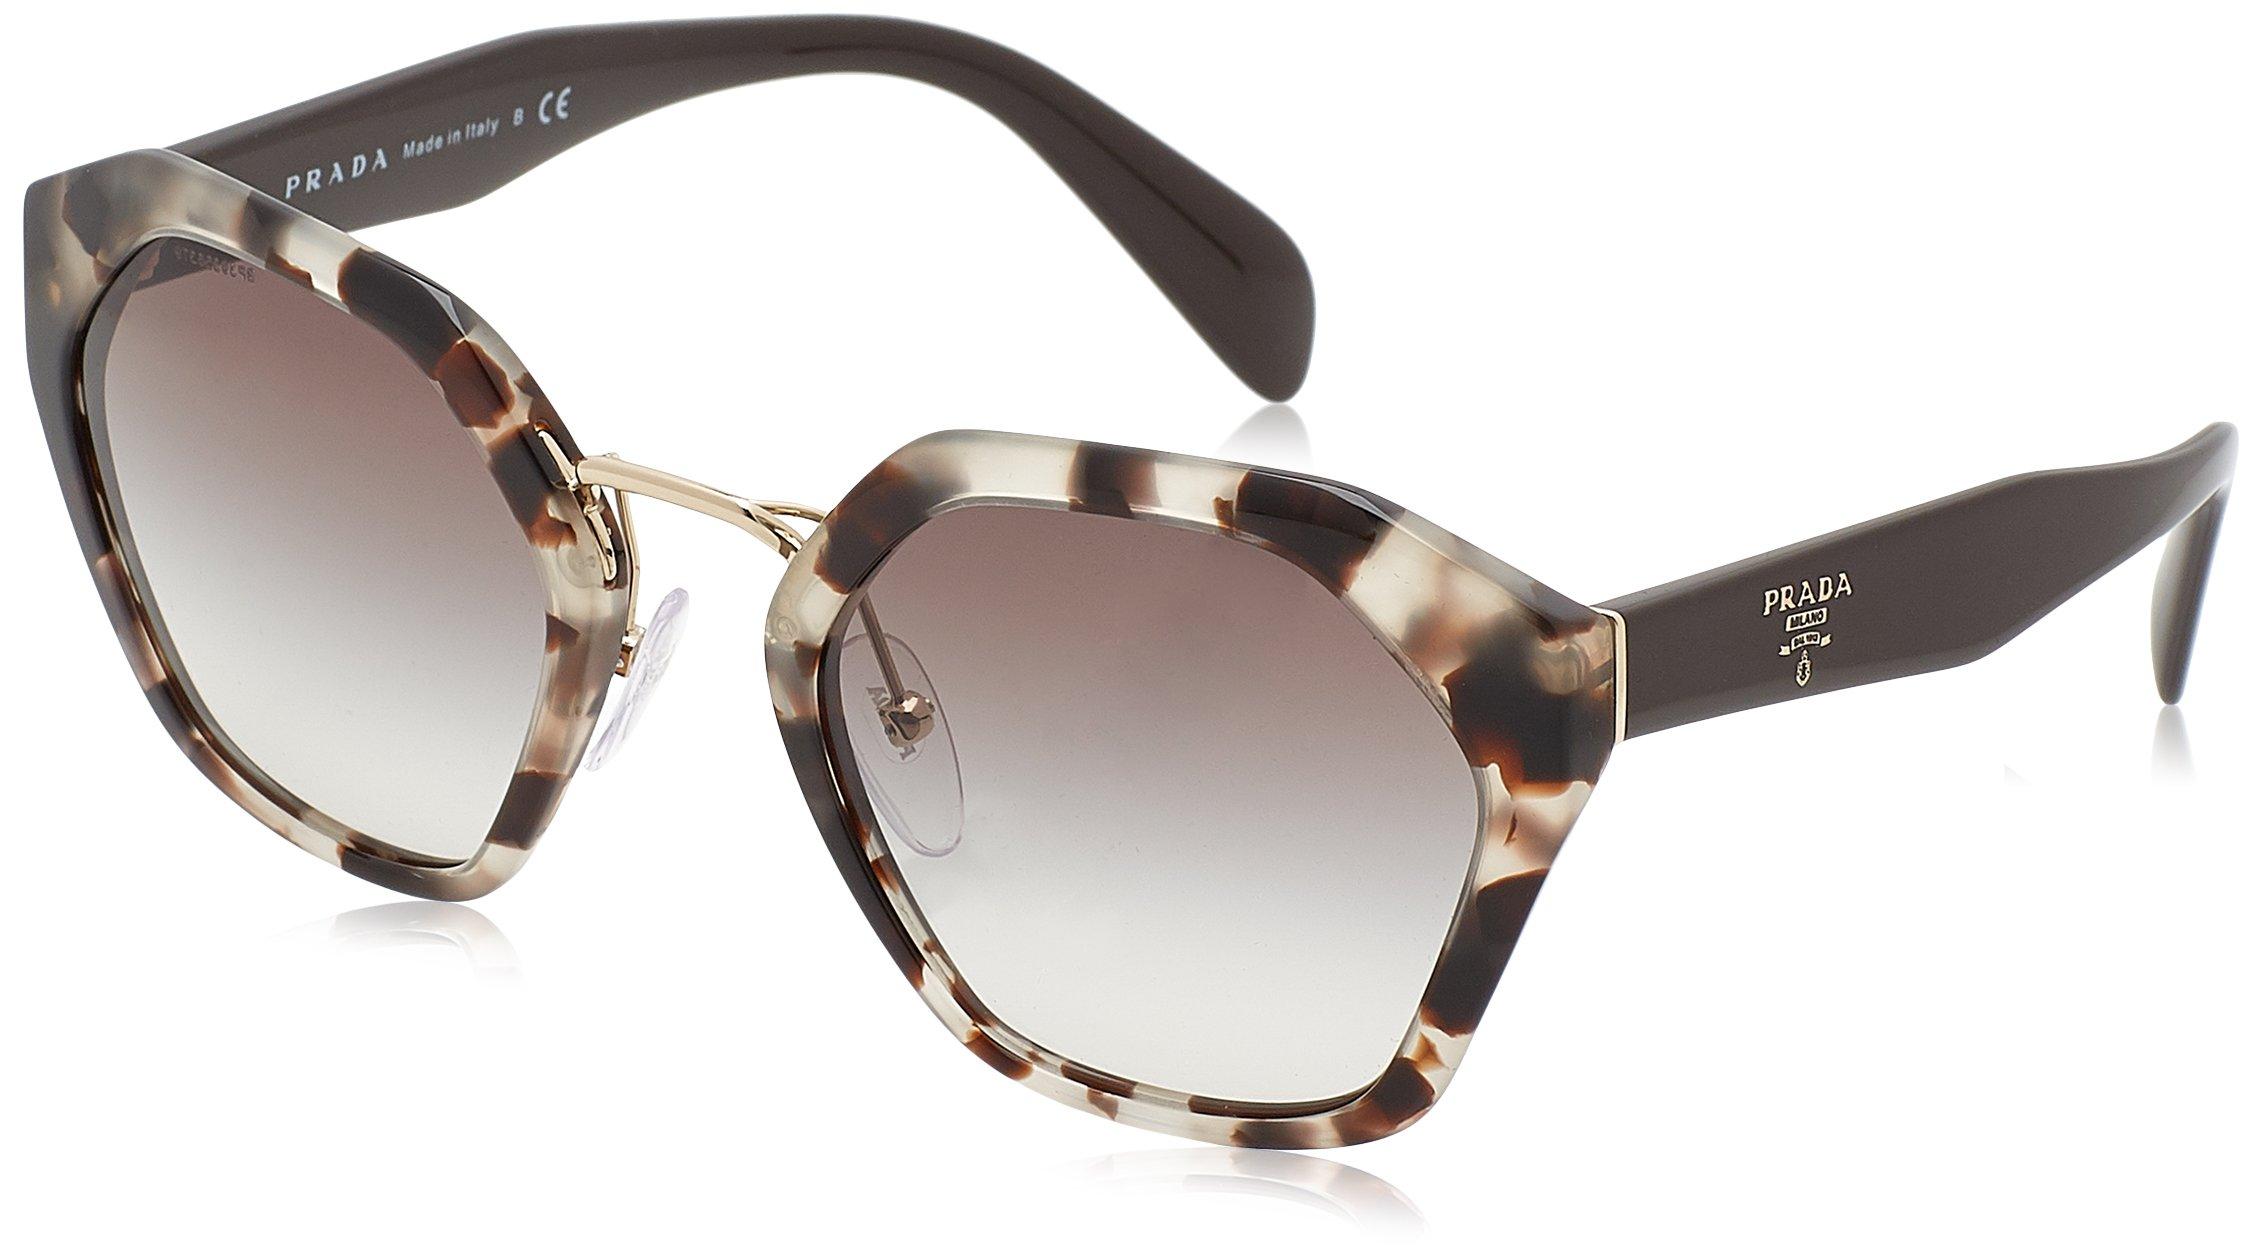 Prada Women's Geometric Sunglasses, Spotted Opal Brown/Grey, One Size